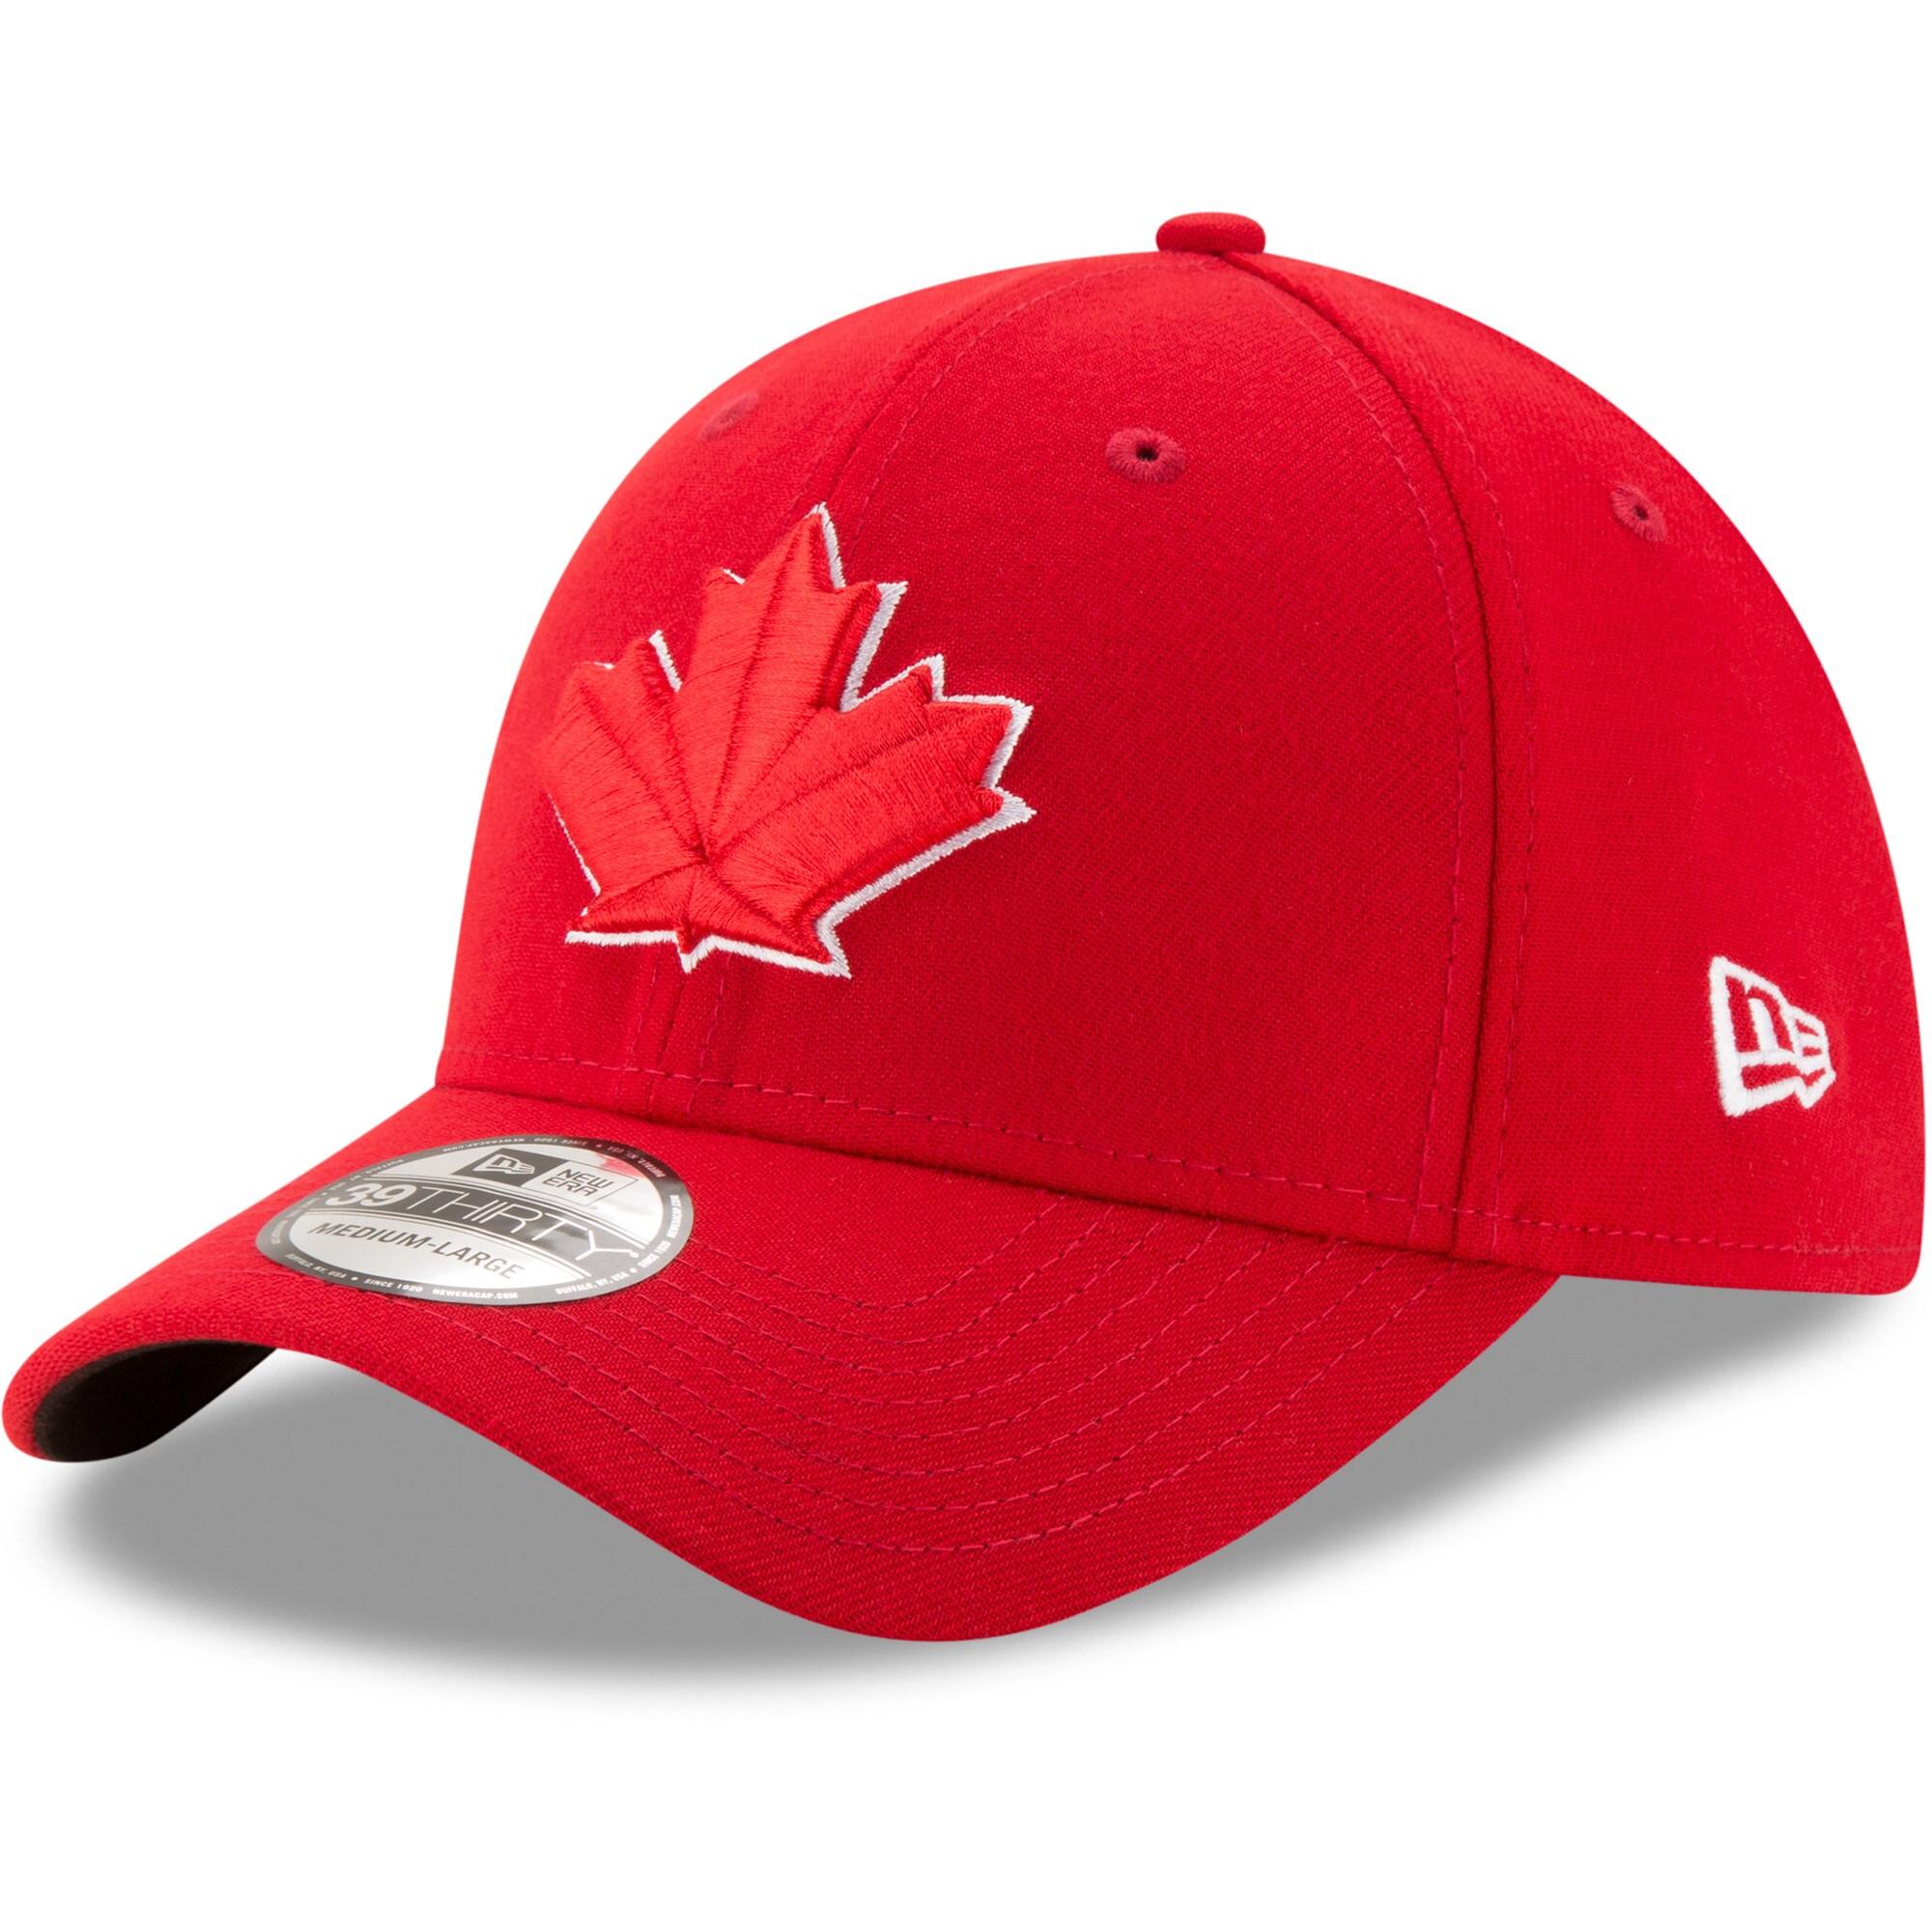 Toronto Blue Jays New Era Alternate 2 Team Classic 39THIRTY Flex Hat - Red